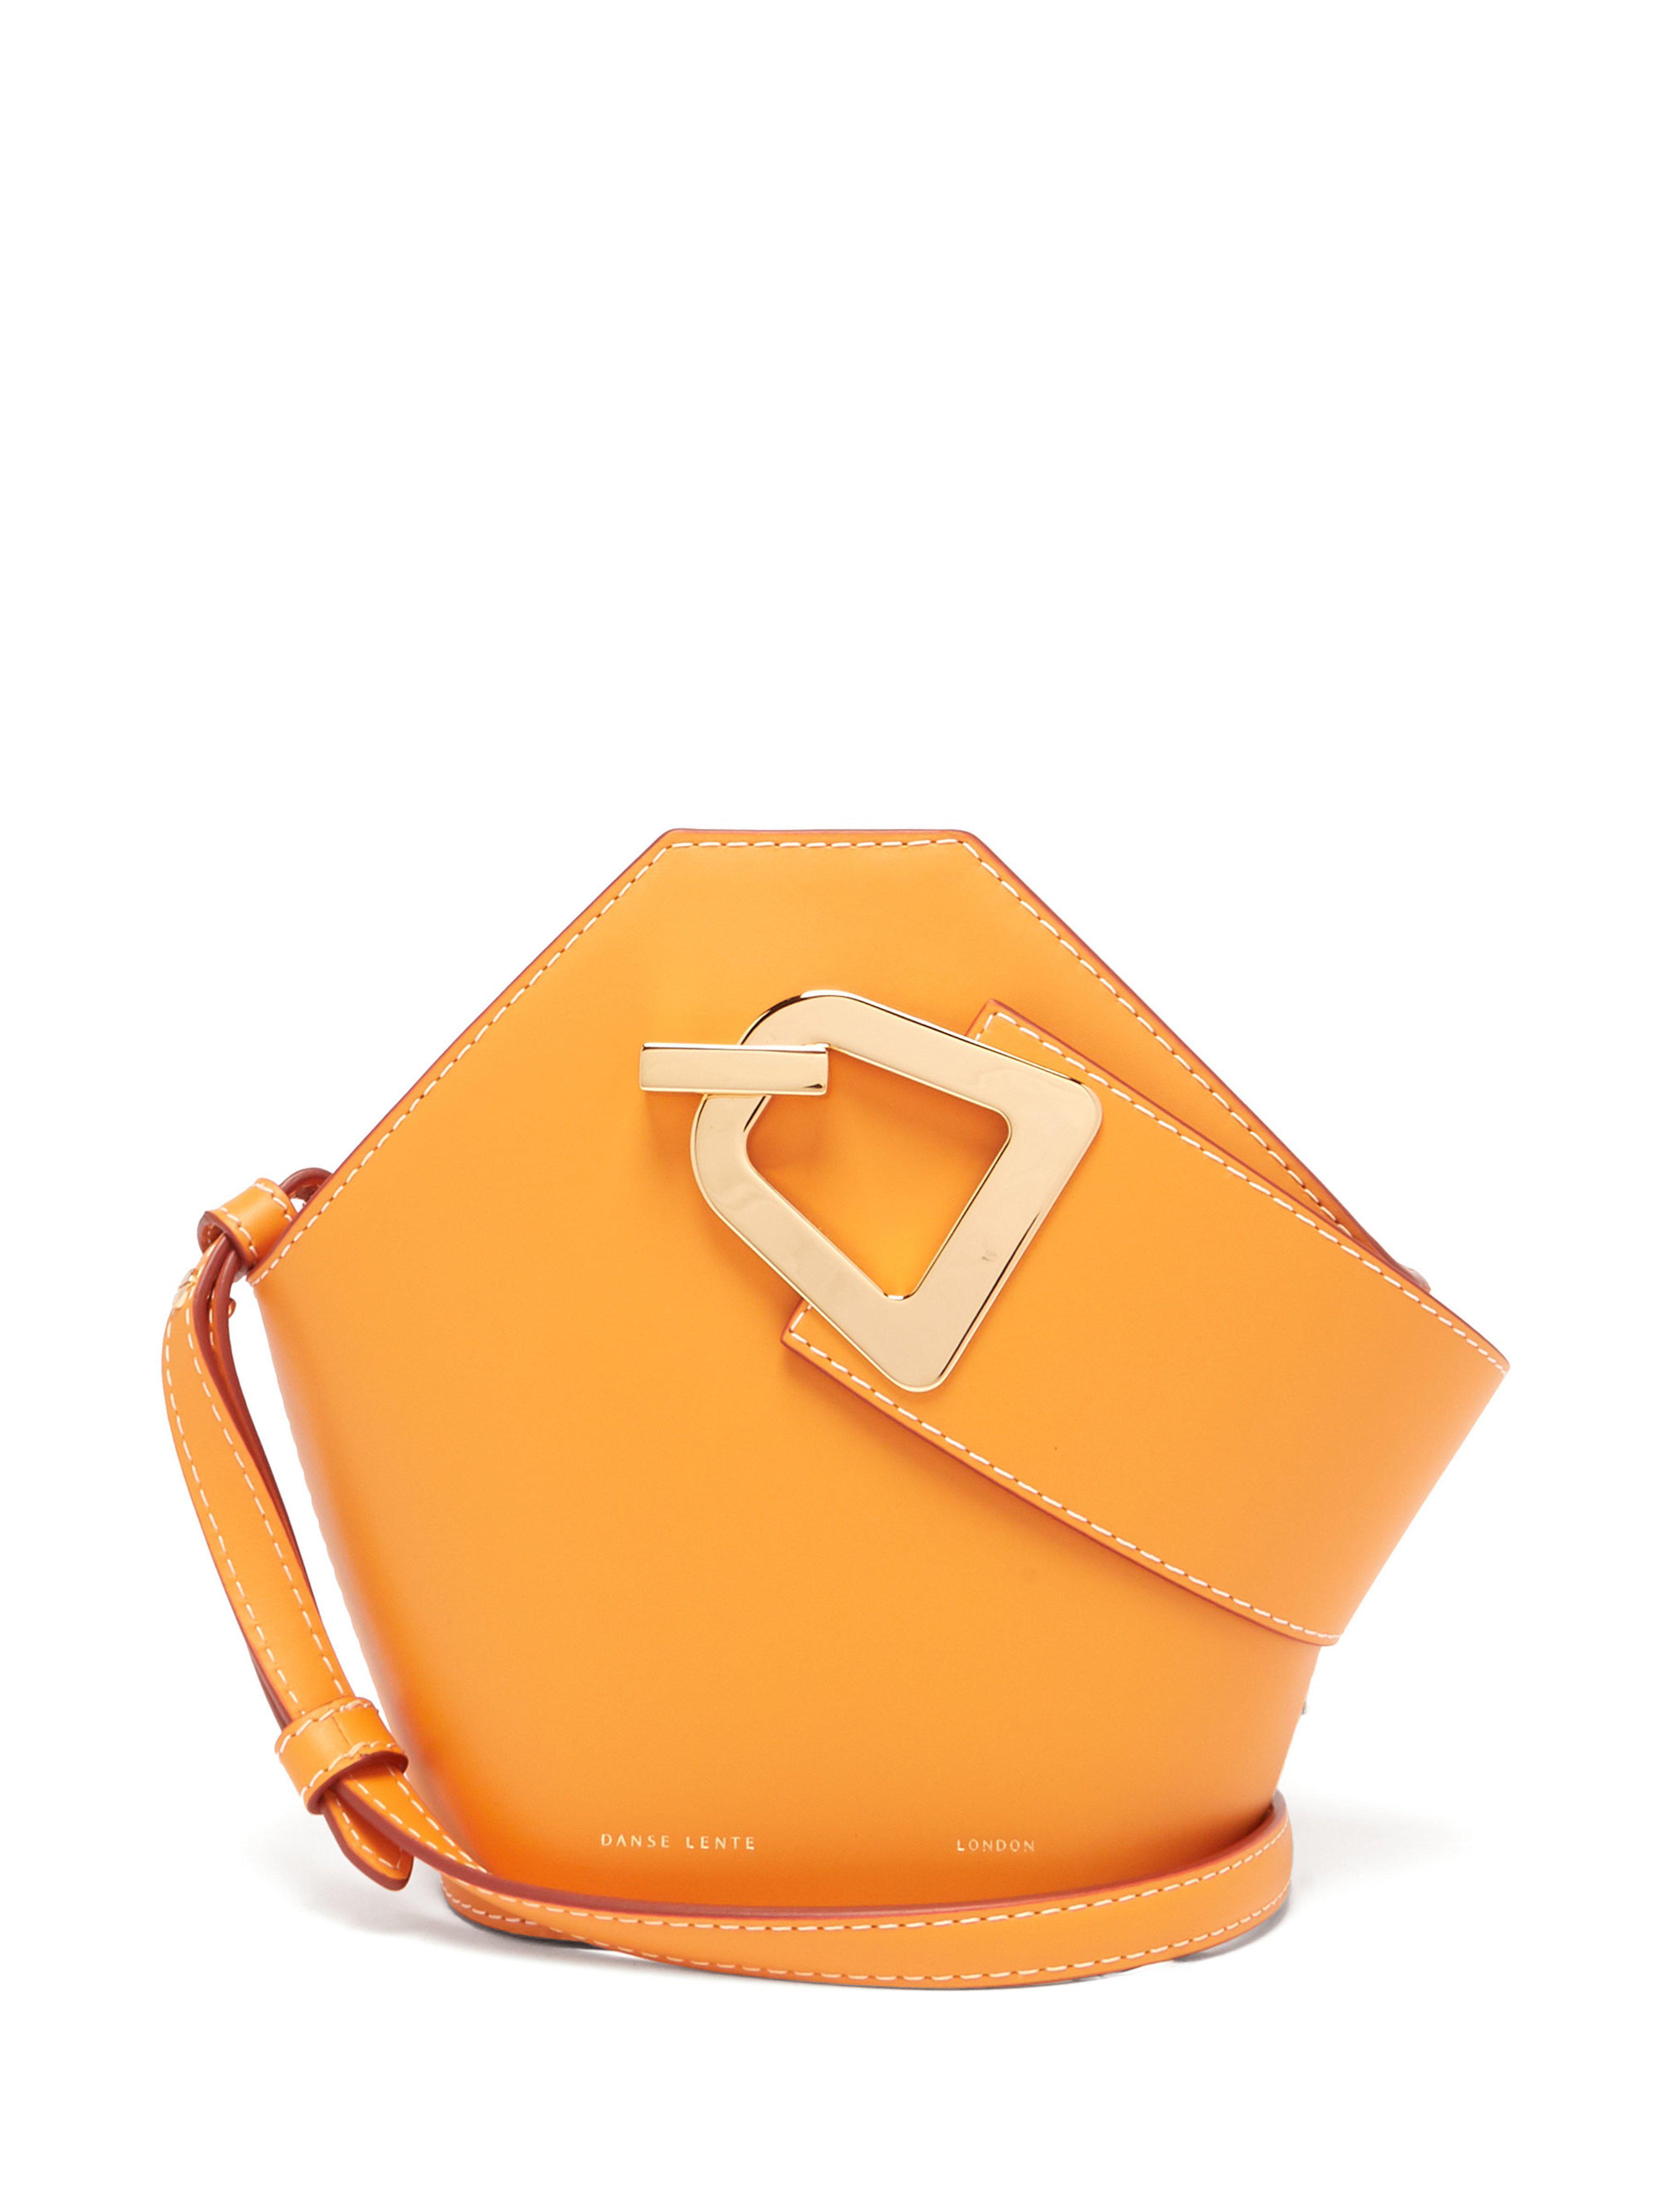 69b286c2af68 Danse Lente - Orange Johnny Mini Leather Bucket Bag - Lyst. View fullscreen